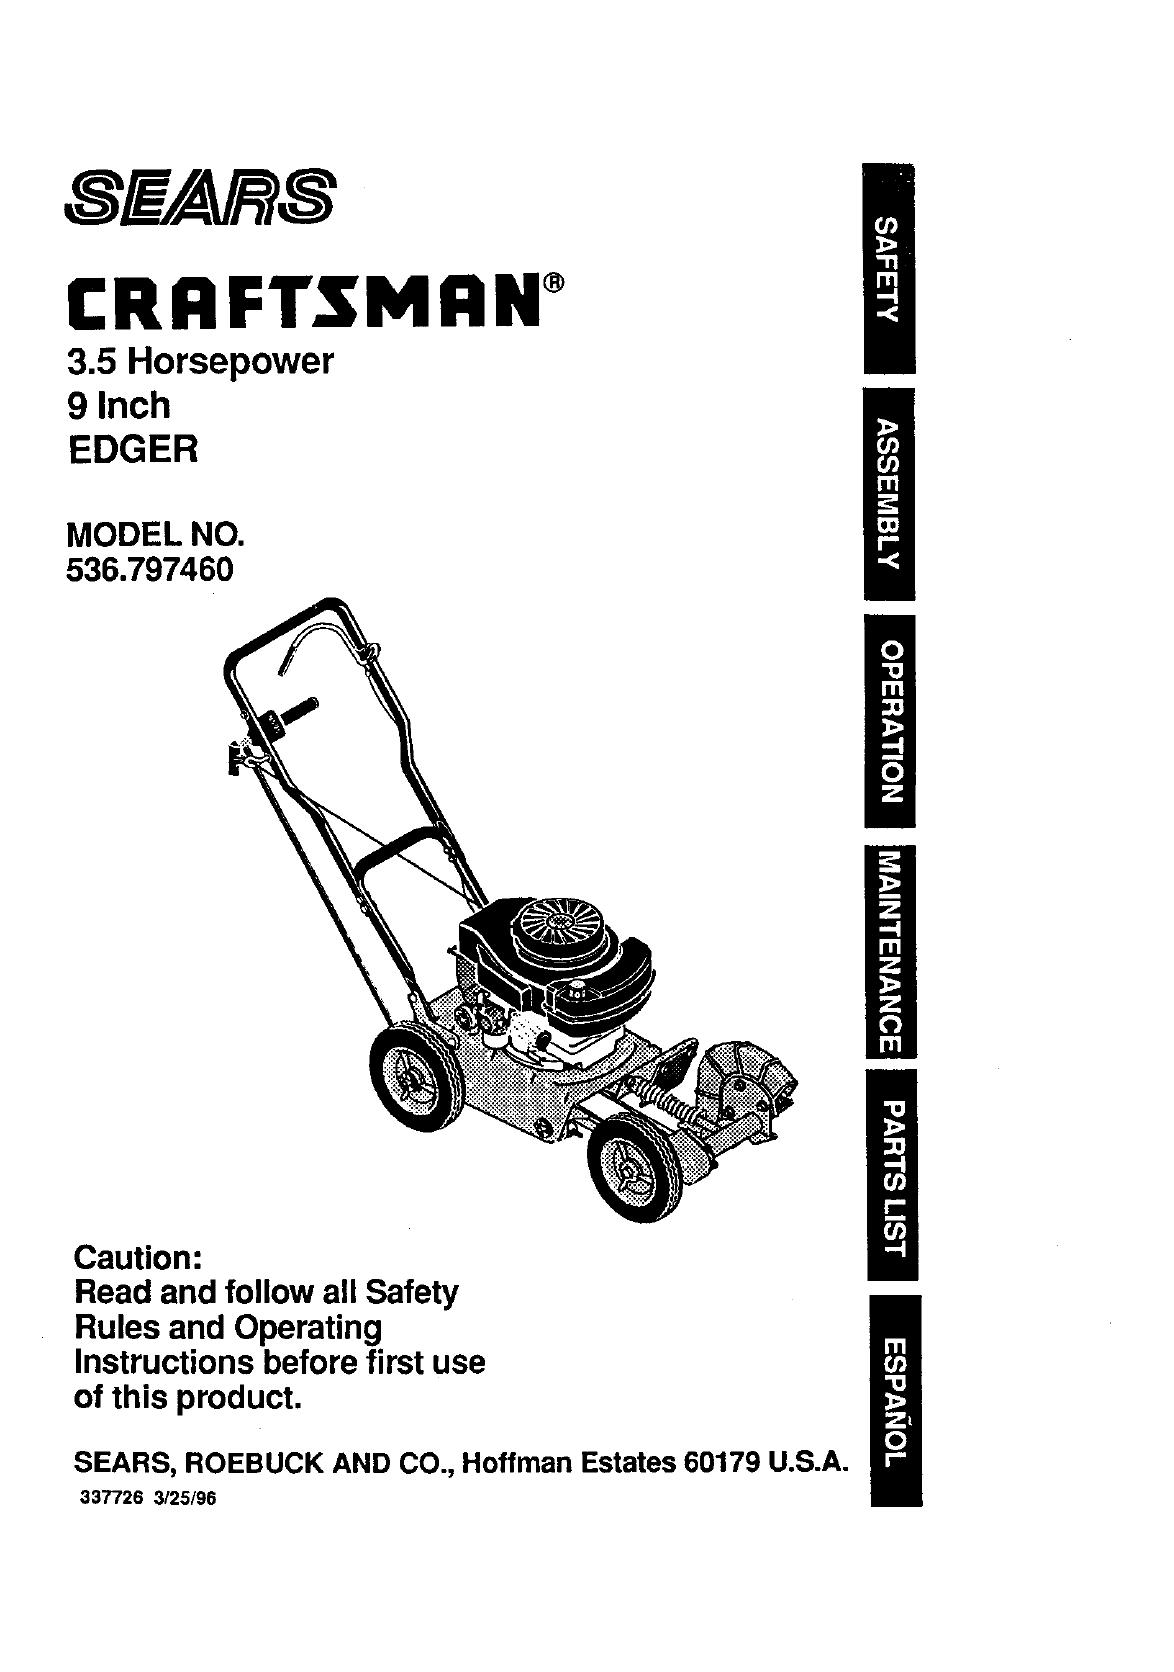 Craftsman User Manual 3 5 Hp 9 Edger Manuals And Guides L